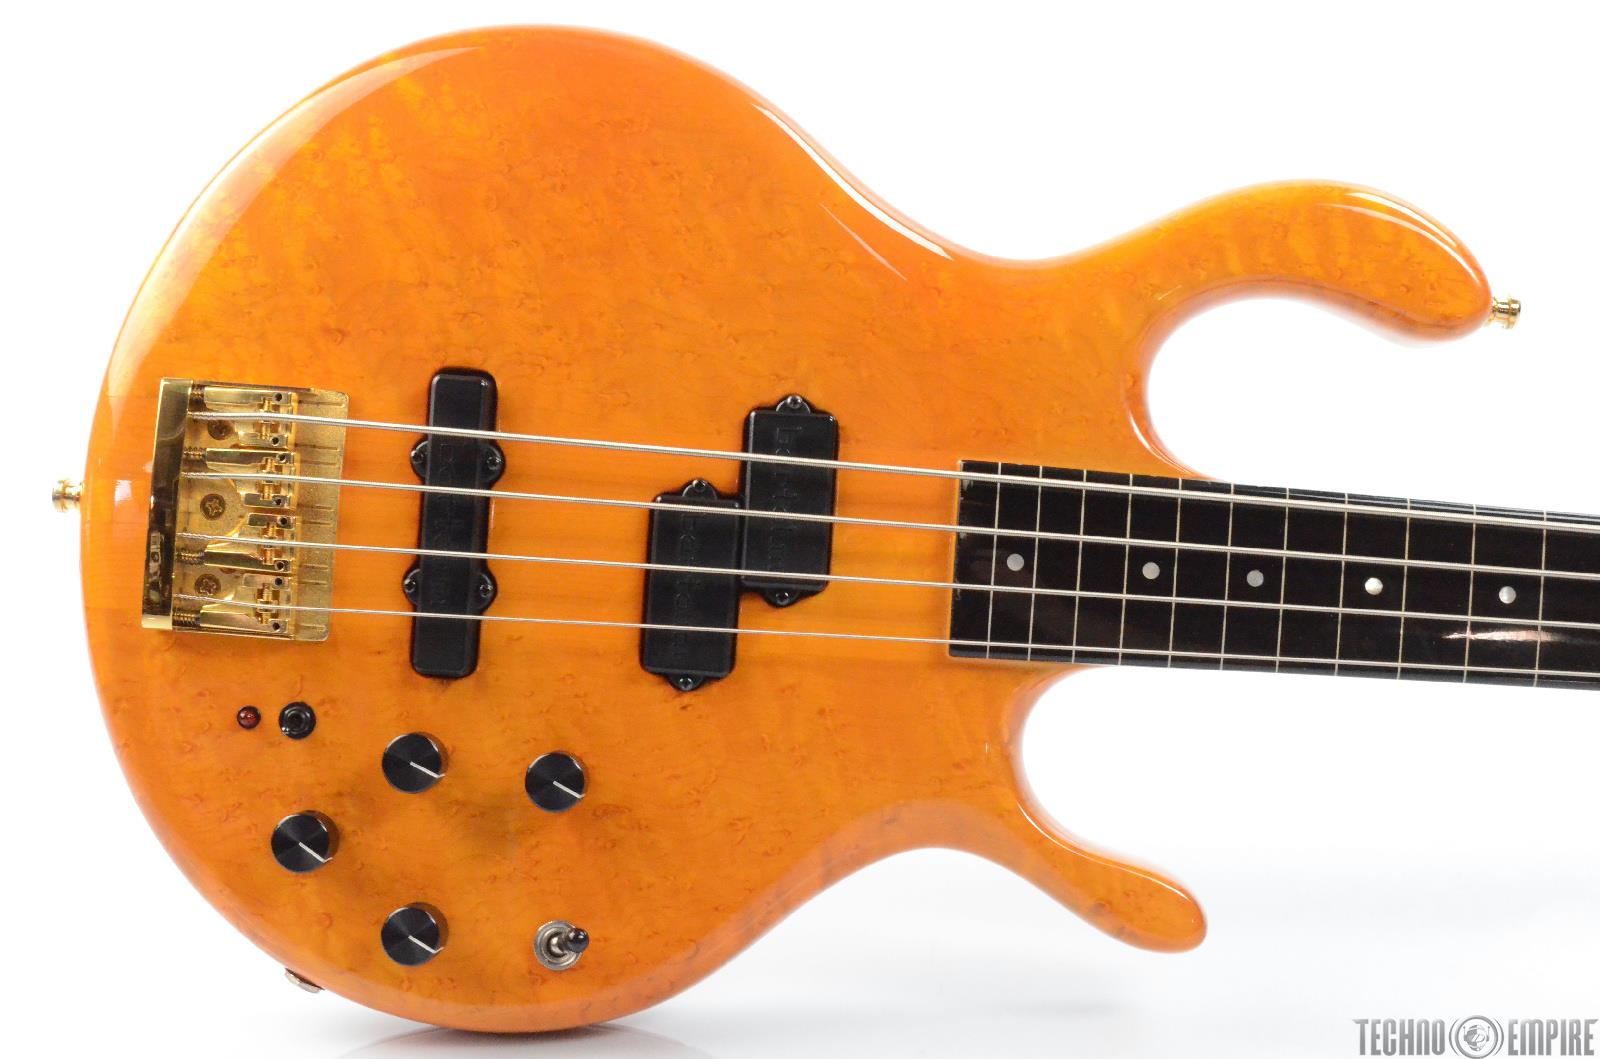 1986 Pedulla Buzz 4-String Fretless Bass Birdseye Maple Bartolini Pickups #29945